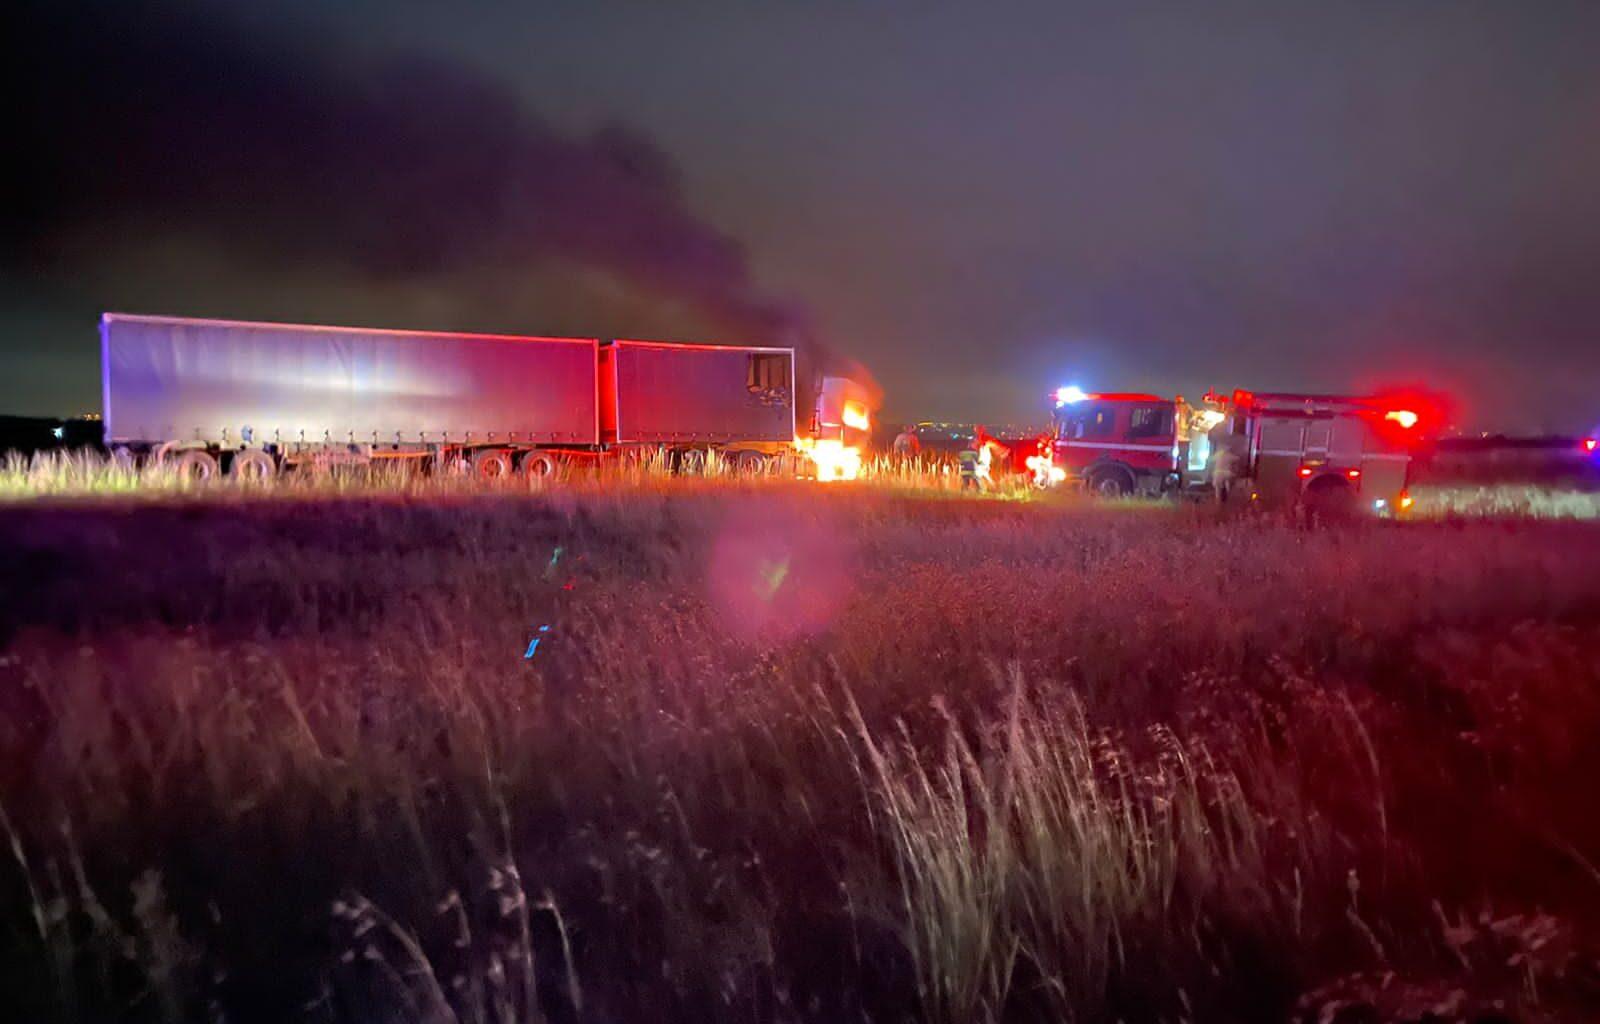 Trucks burned on R59